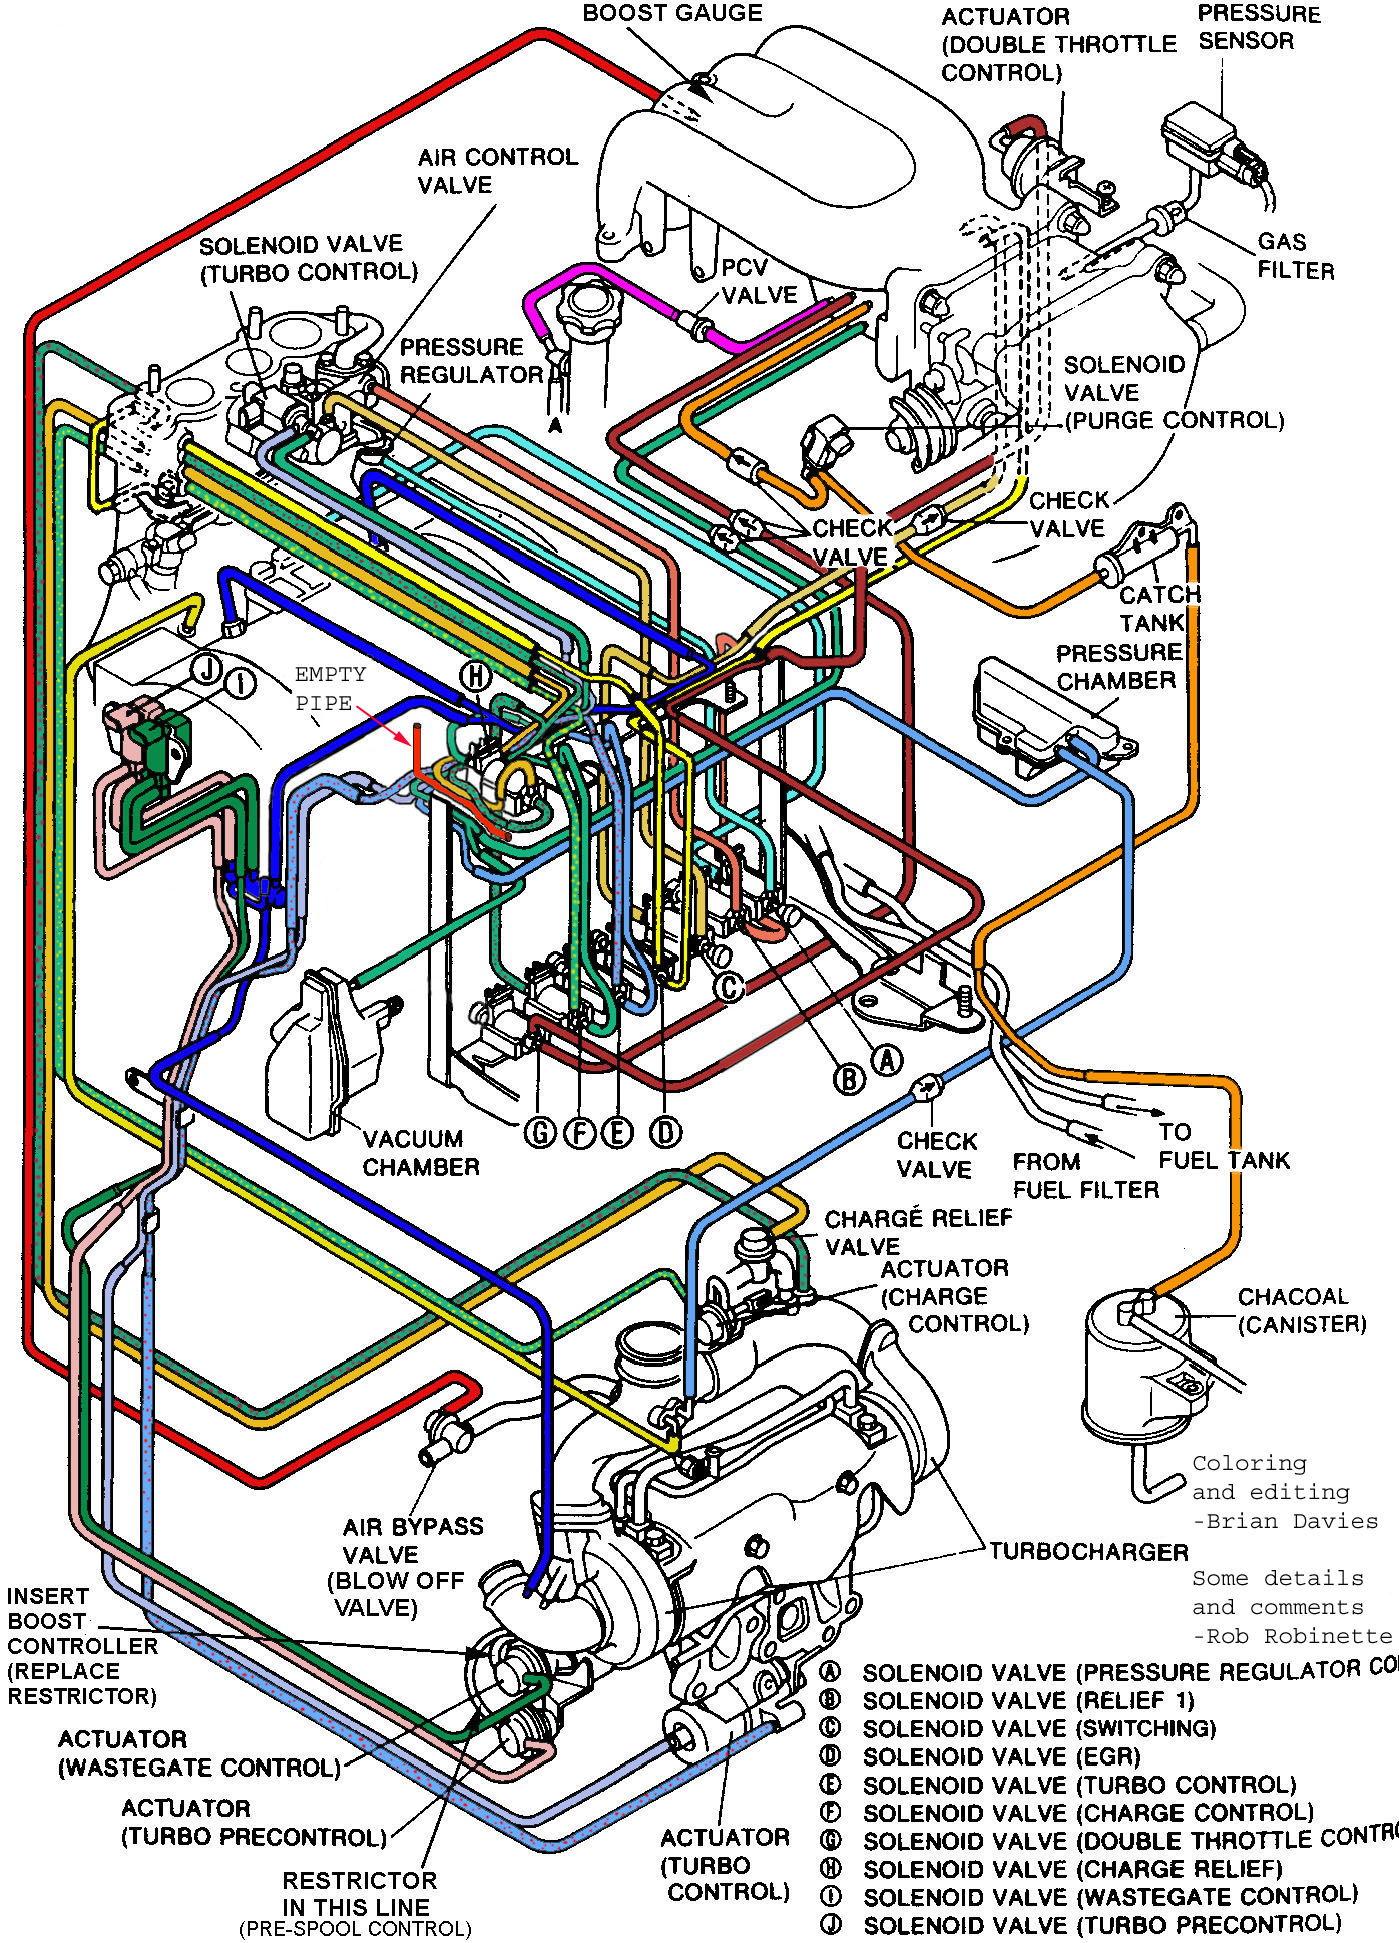 80 vacuum_hose_diagram2_b485e90da490ae0b2226abbe43825018bd3a8db4 jw pro jay intake manifolds rx7club com mazda rx7 forum  at reclaimingppi.co